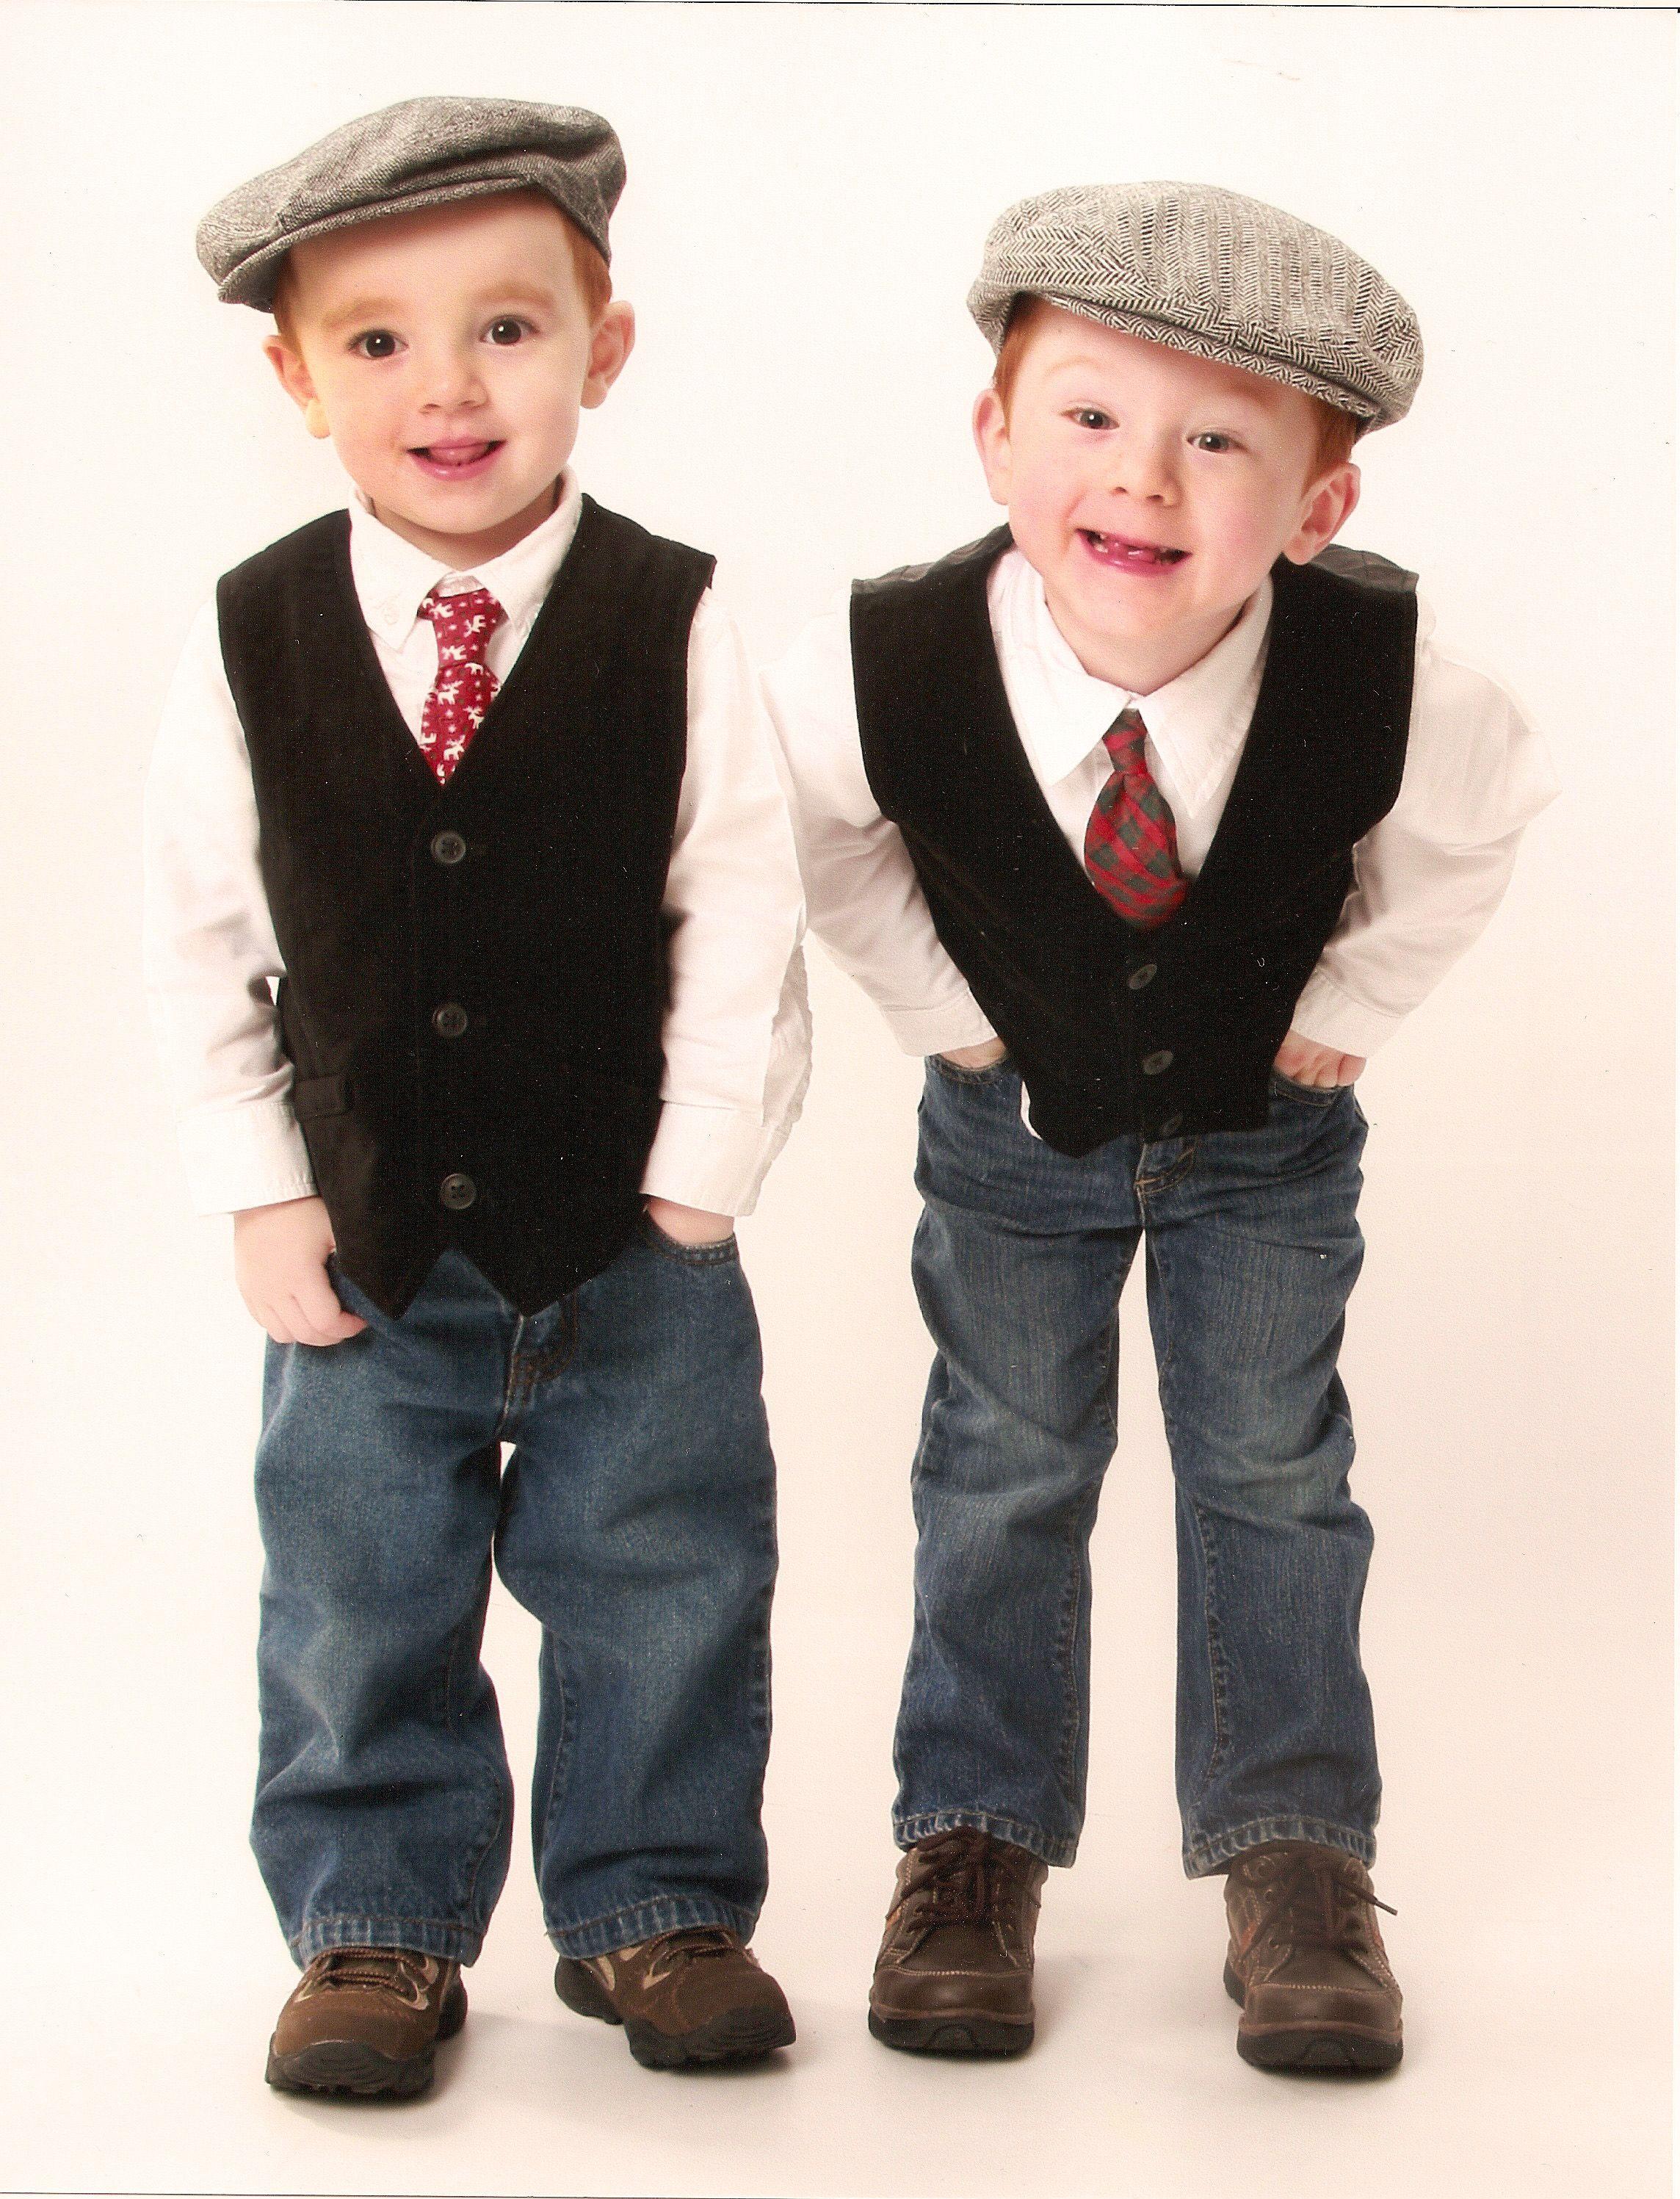 725e7d380ce9 Little boys dressed as dapper little men.